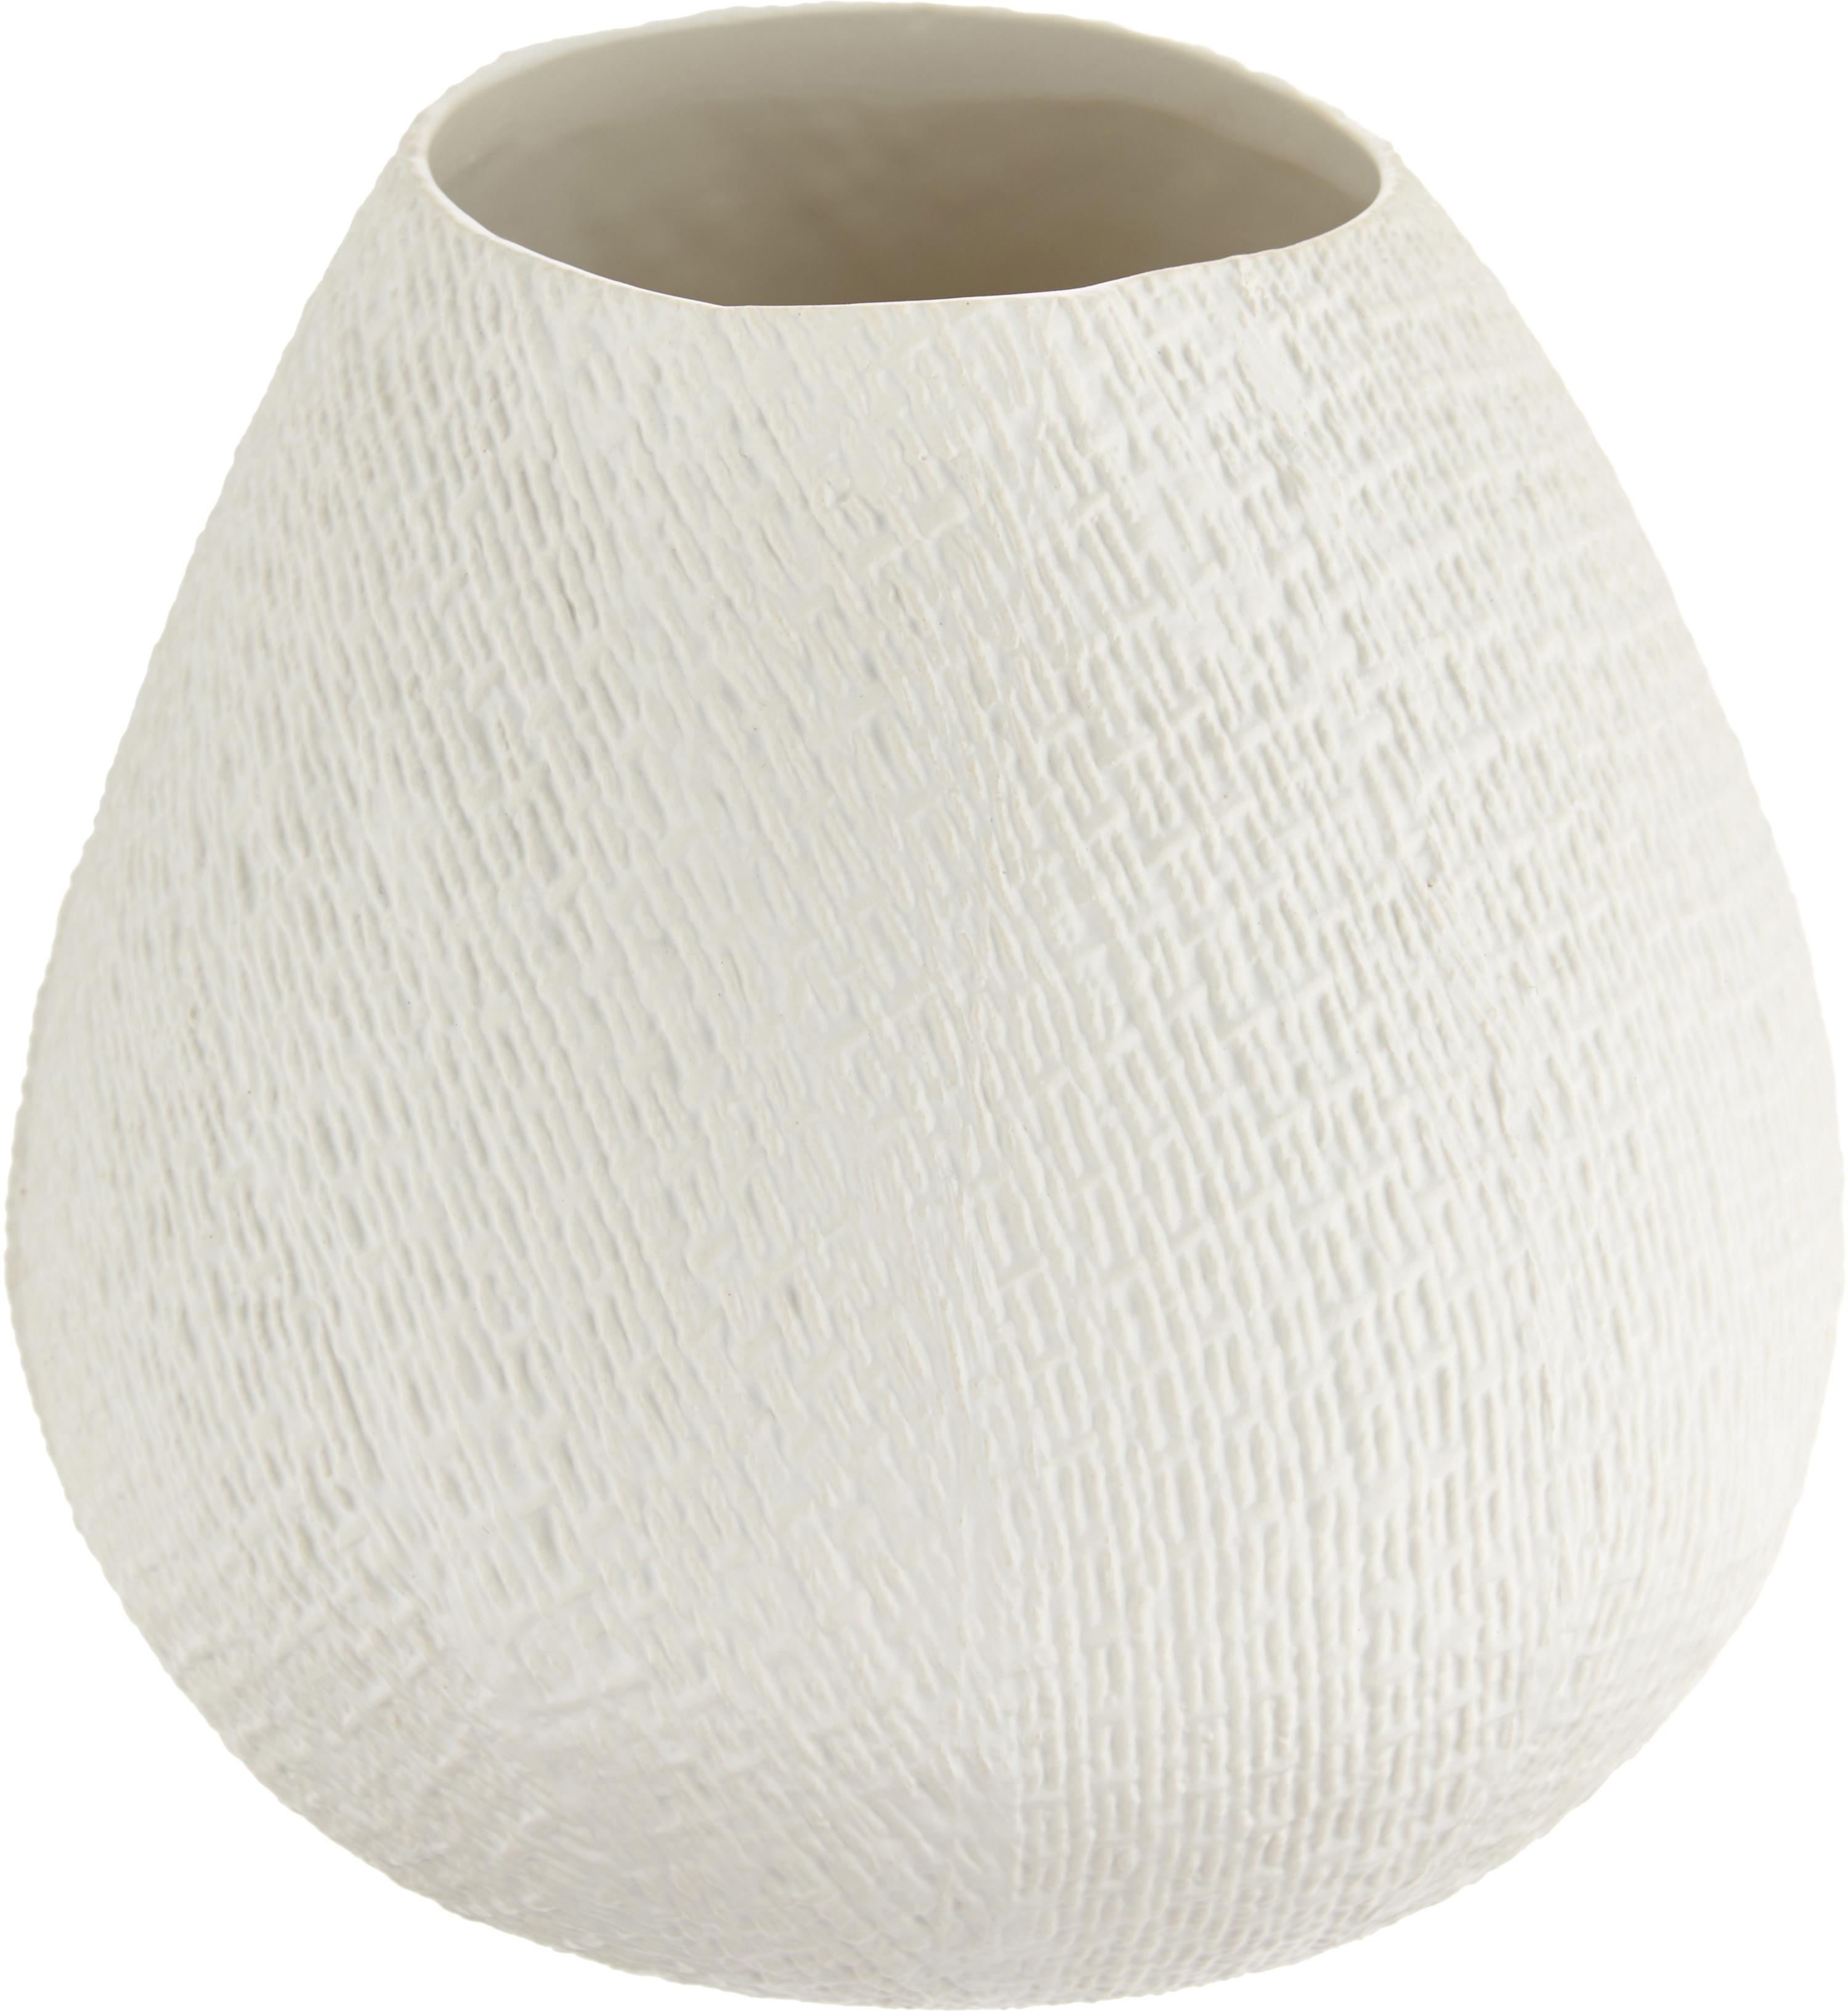 Vaso fatto a mano Wendy, Ceramica, Bianco crema opaco, Ø 19 x Alt. 20 cm